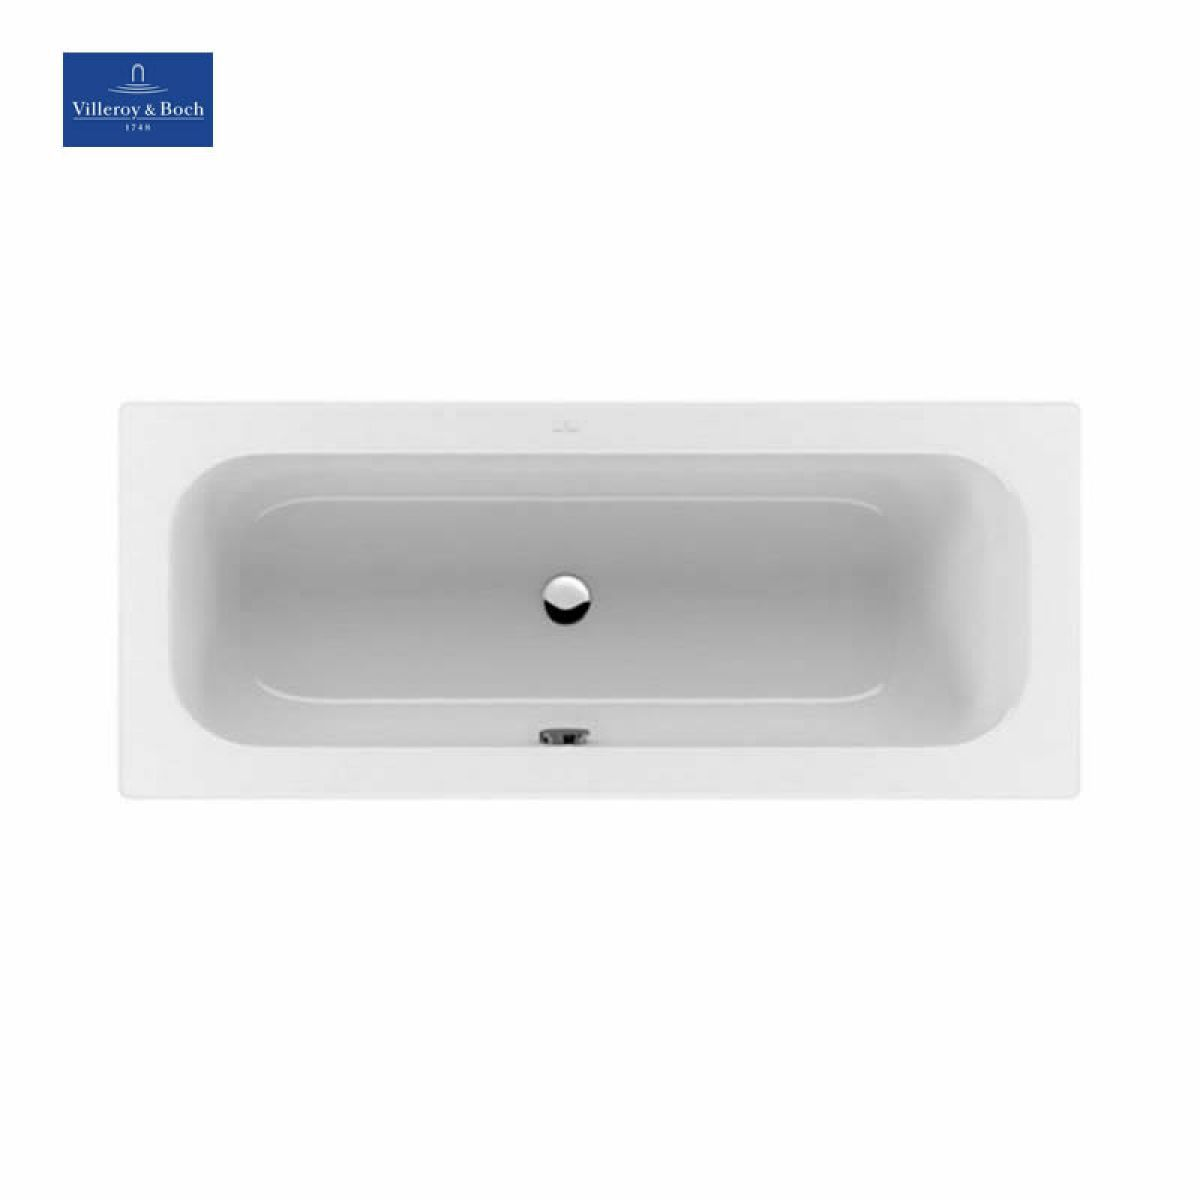 v b loop friends square duo single ended bath uk bathrooms. Black Bedroom Furniture Sets. Home Design Ideas